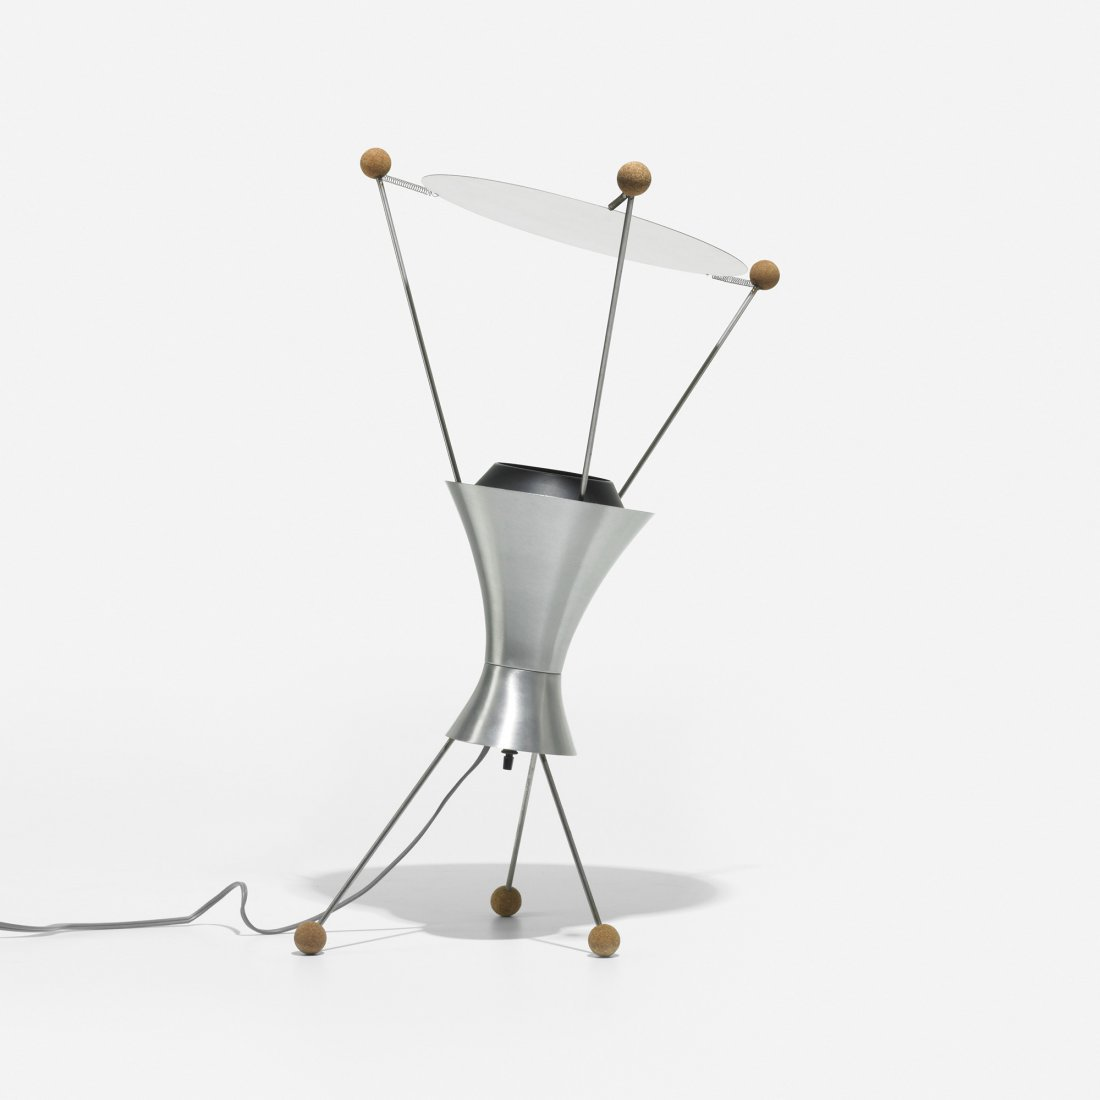 106: James Harvey Crate table lamp, model T-C-3